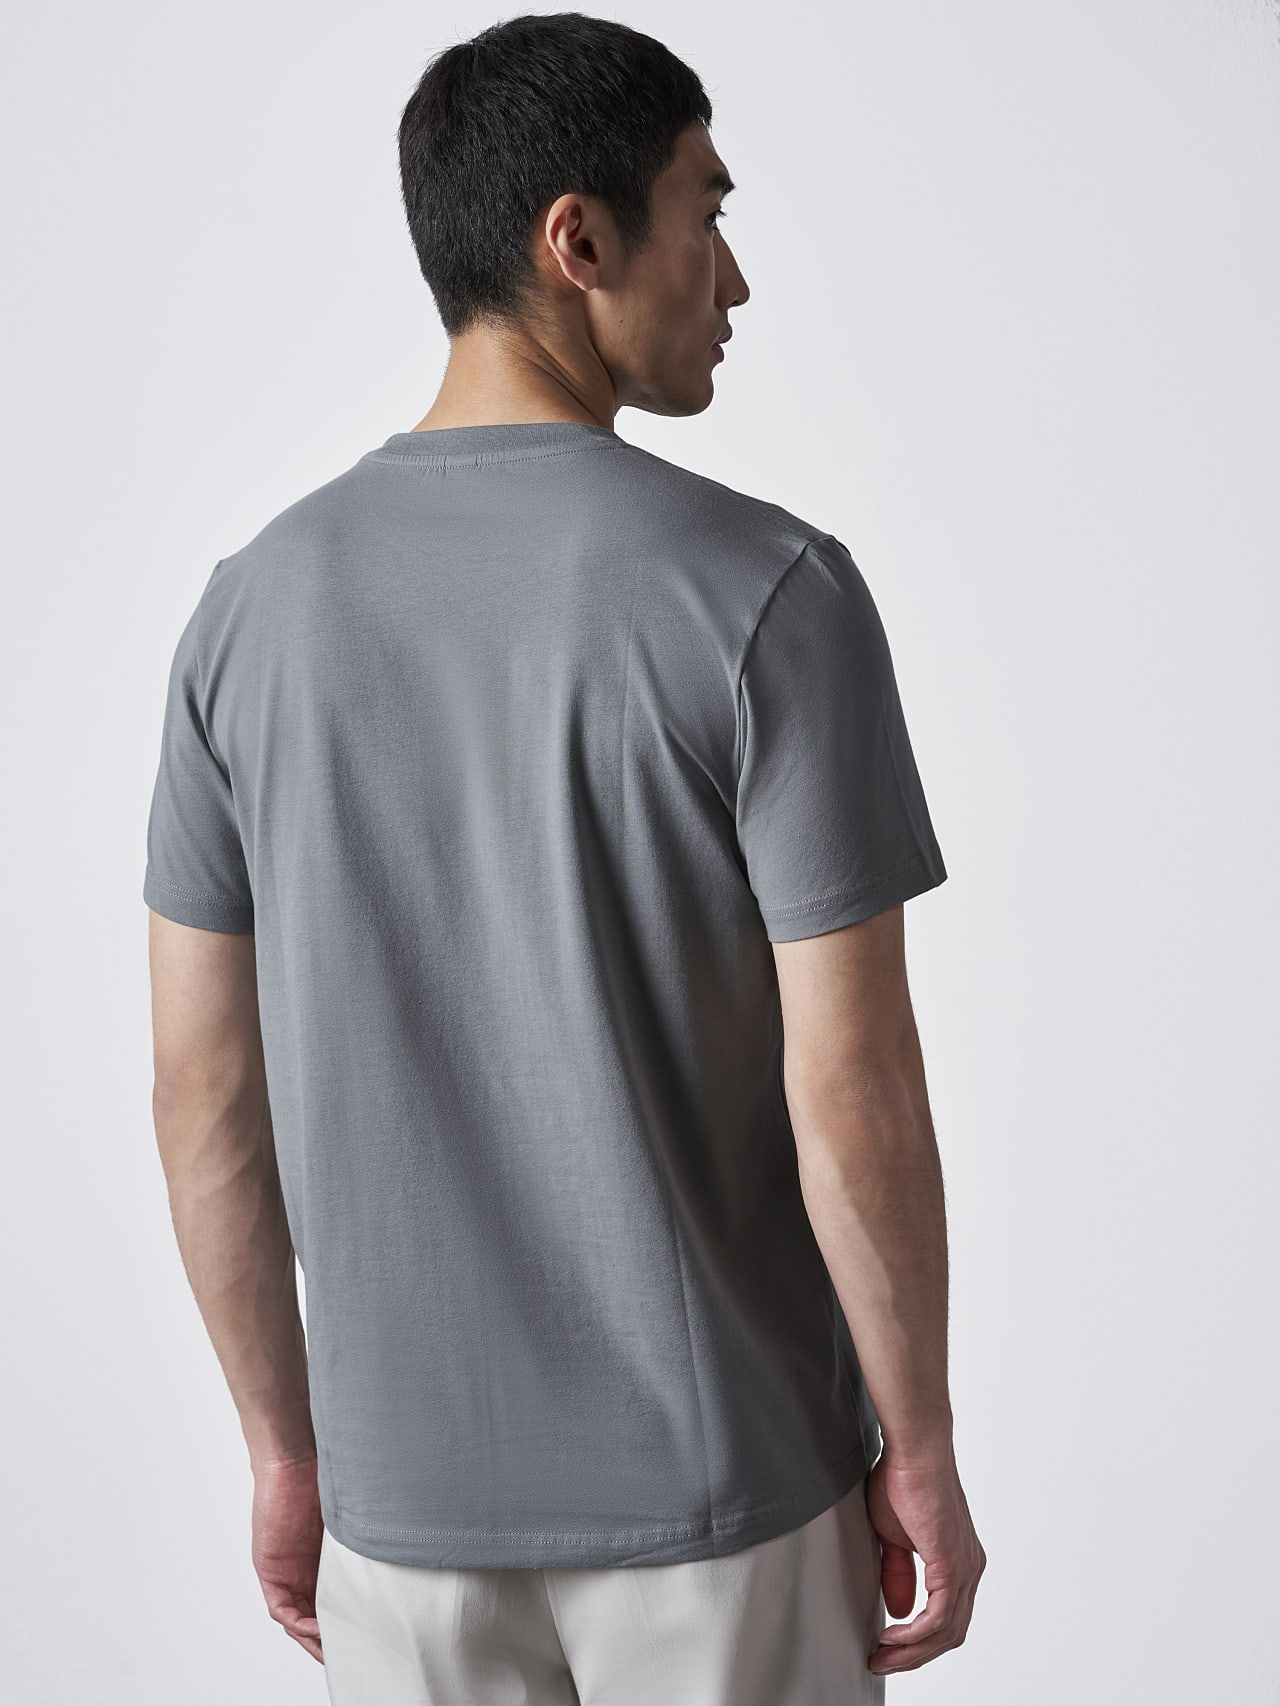 JERO V2.Y4.02 Signature Logo T-Shirt Grey Front Main Alpha Tauri